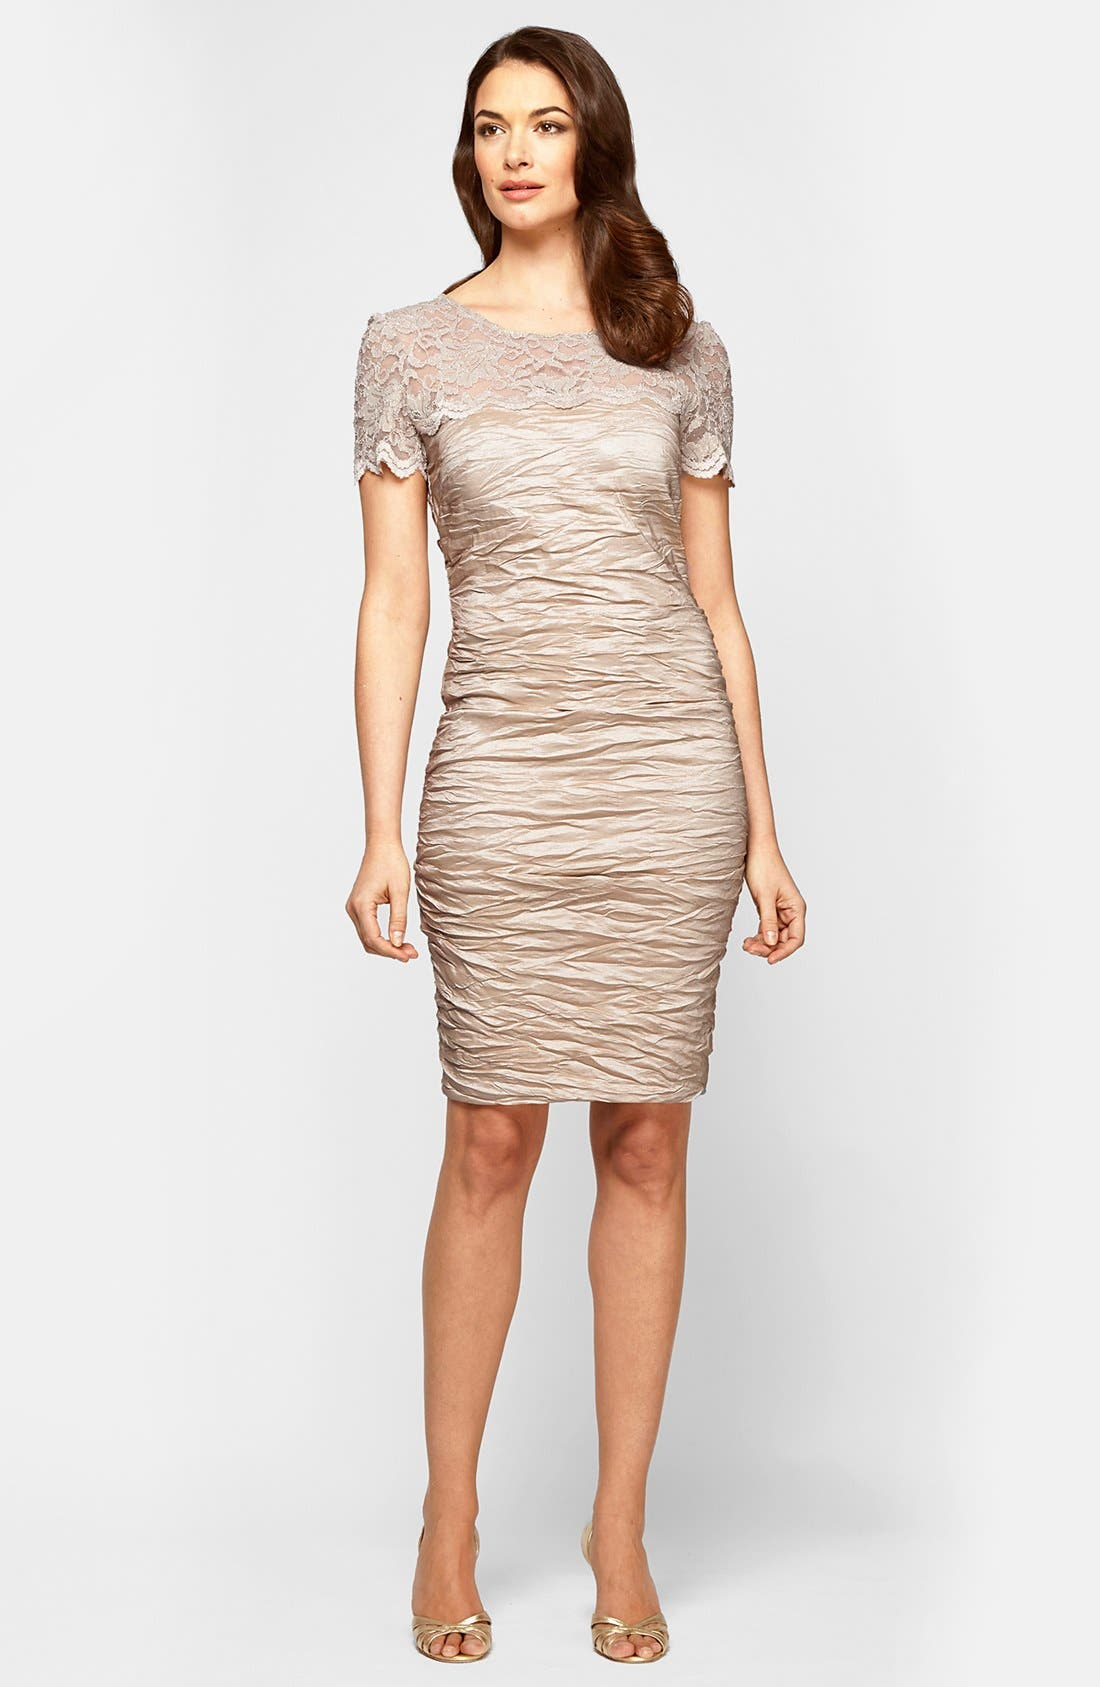 Alternate Image 1 Selected - Alex Evenings Lace Illusion Yoke Sheath Dress